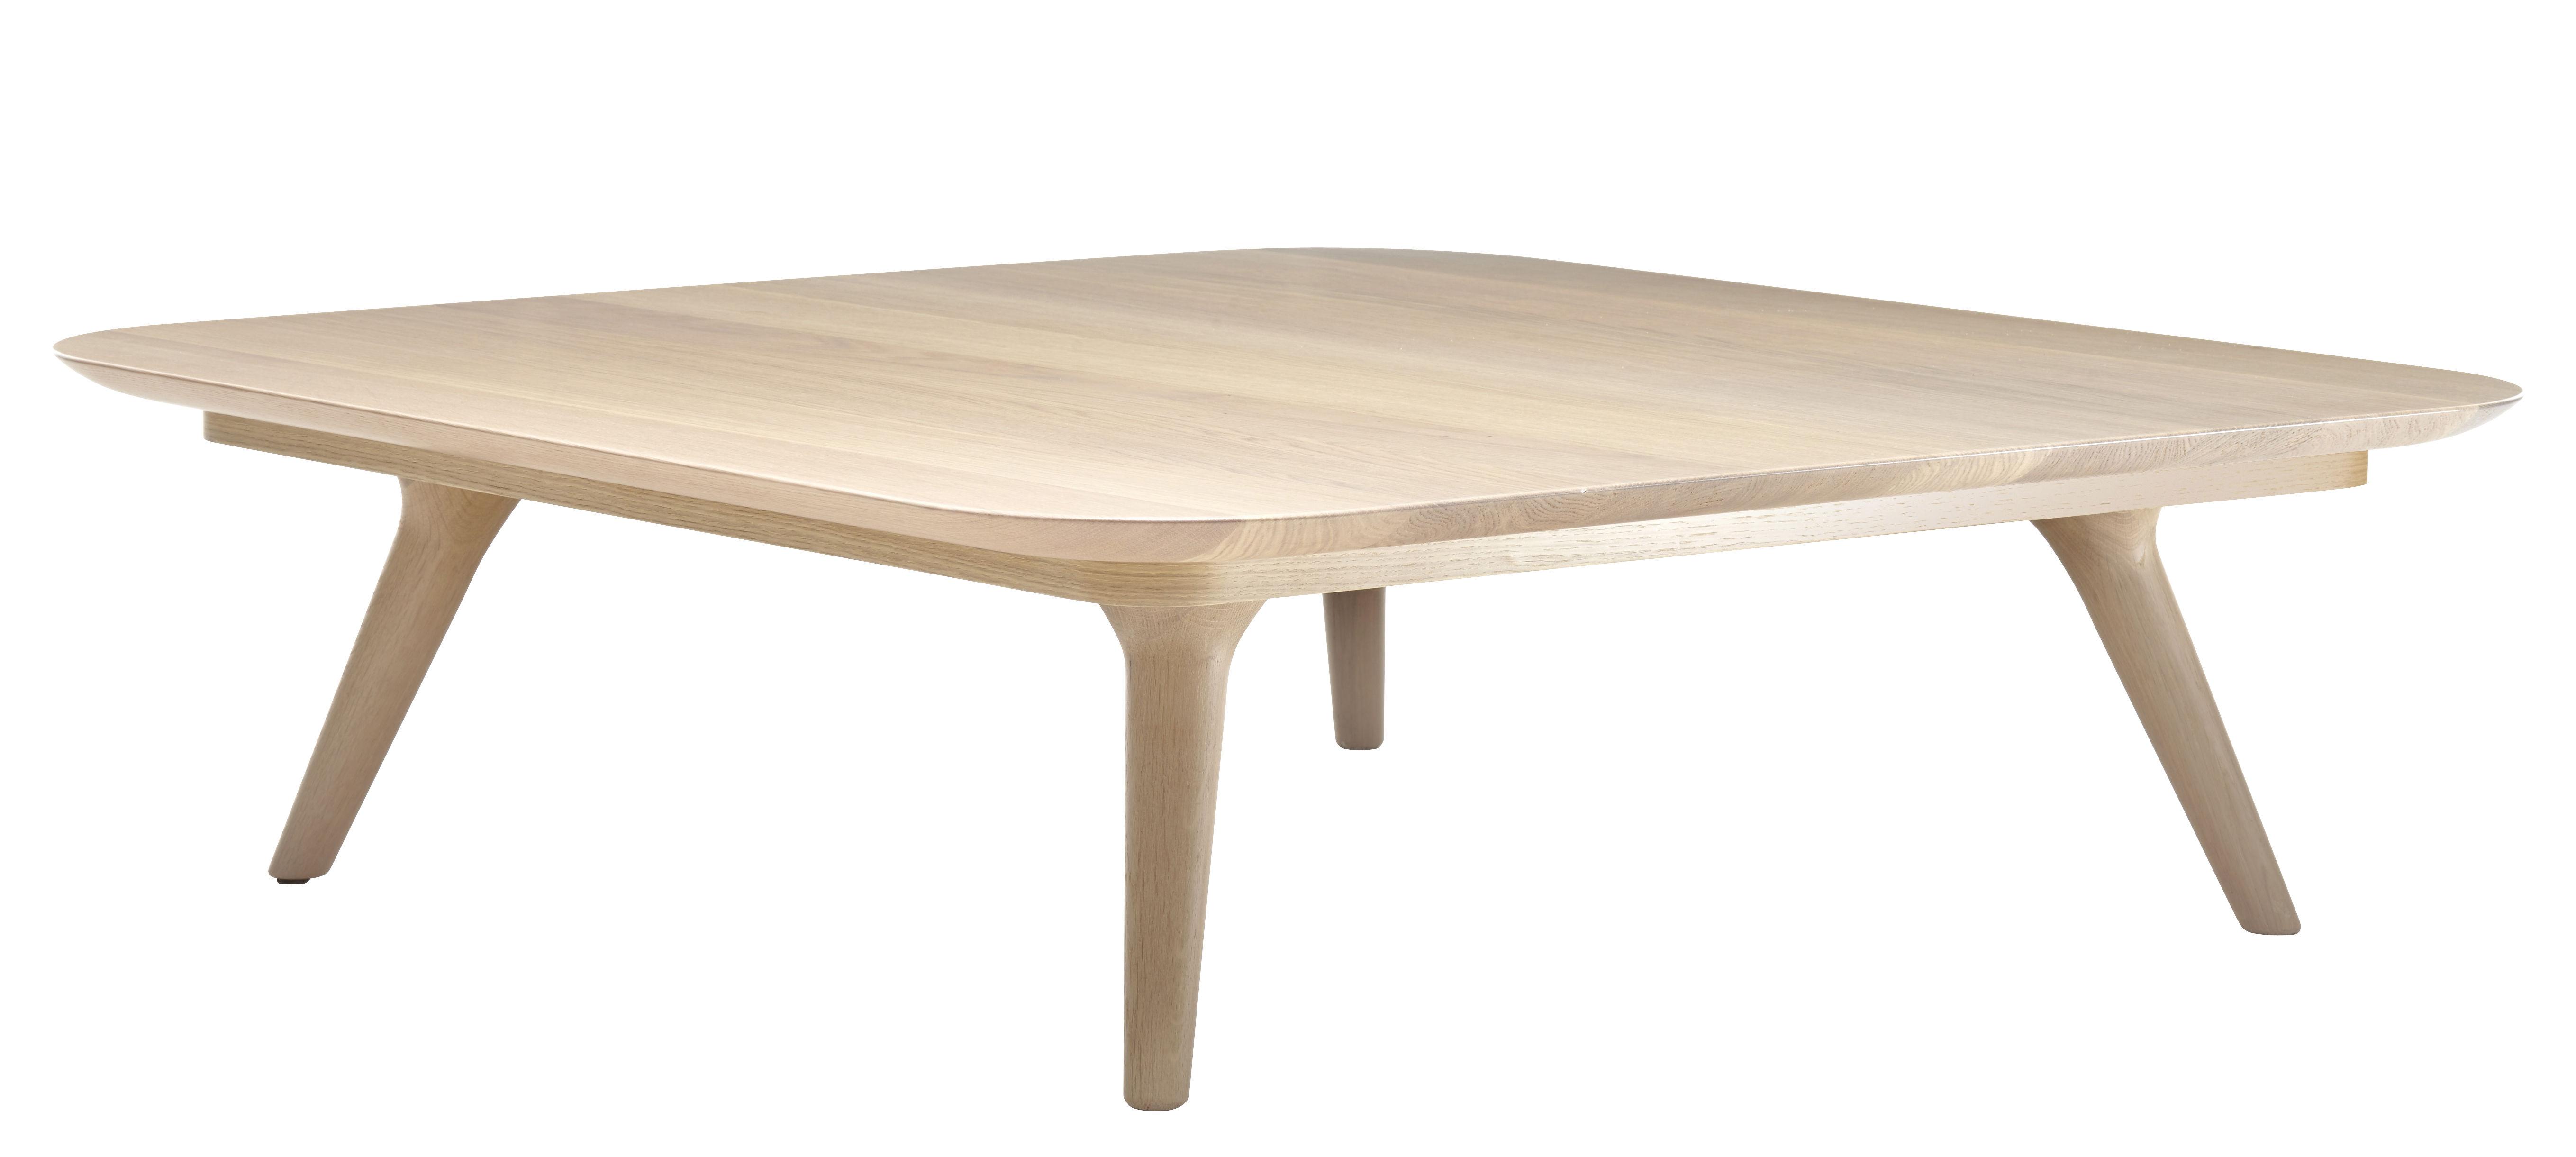 Mobilier - Tables basses - Table basse Zio / 110 x 110 cm - Chêne - Moooi - Chêne blanchi - Chêne massif blanchi